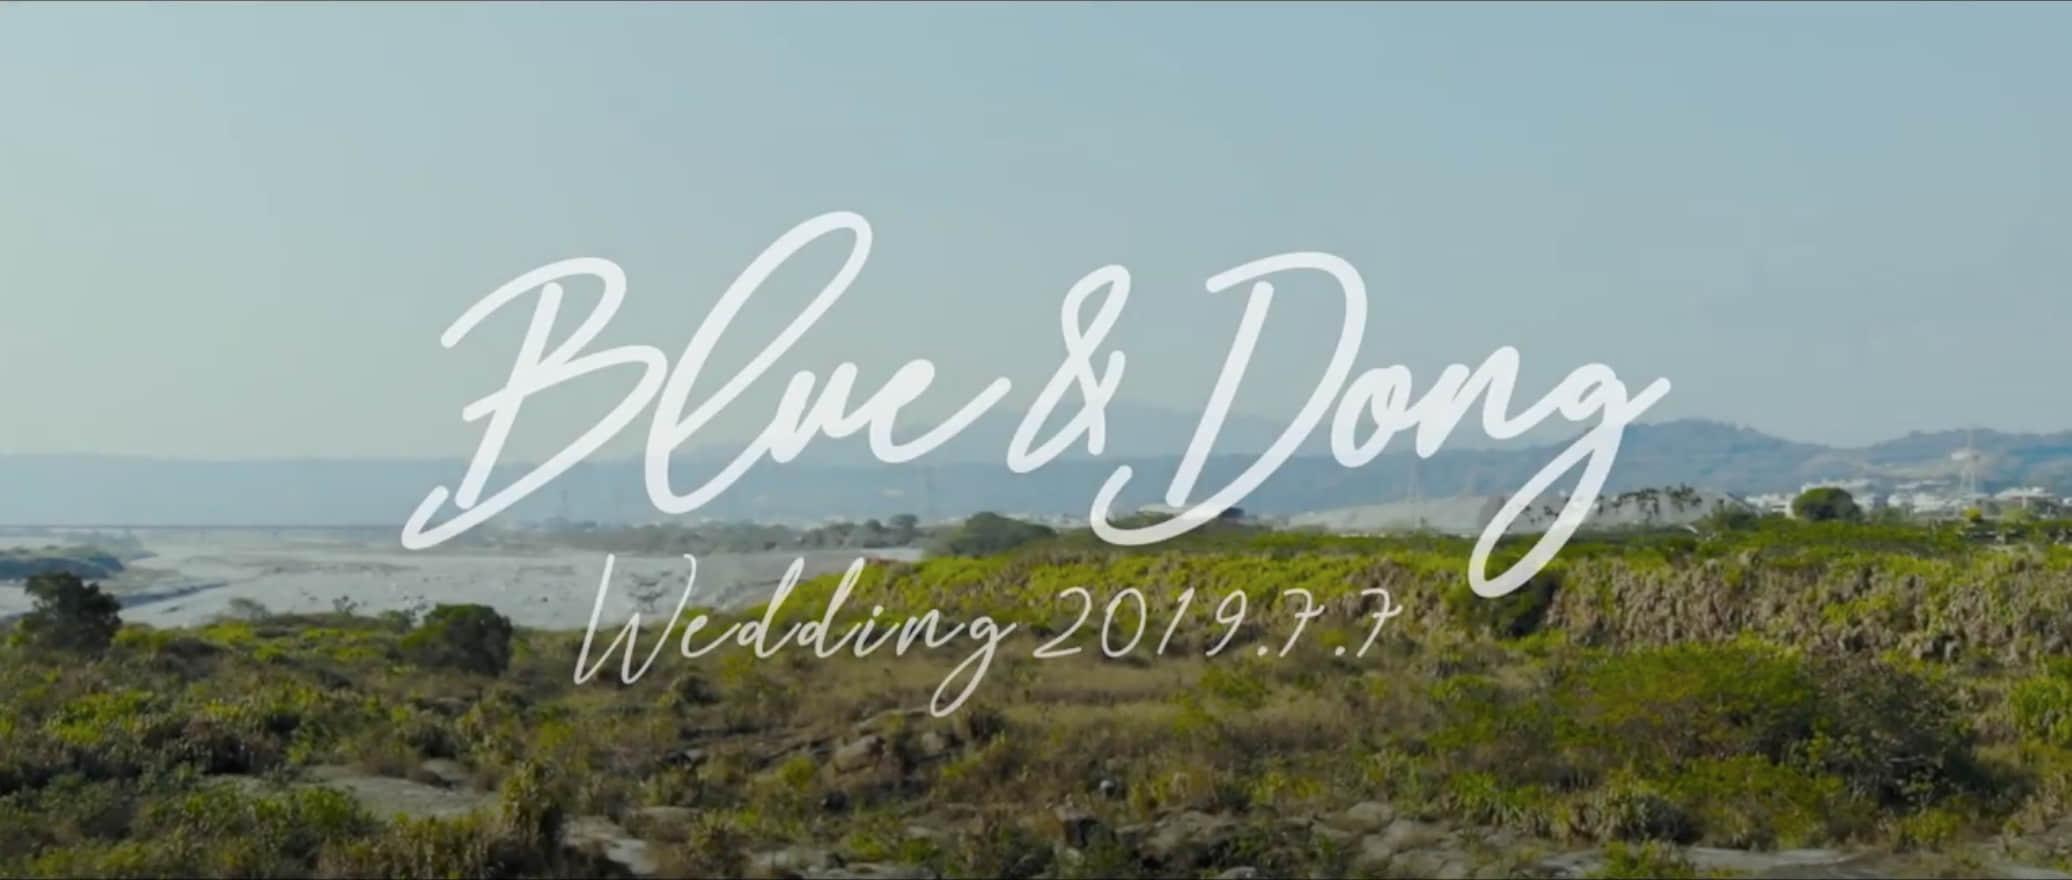 Blue & Dong Pre-wedding MV